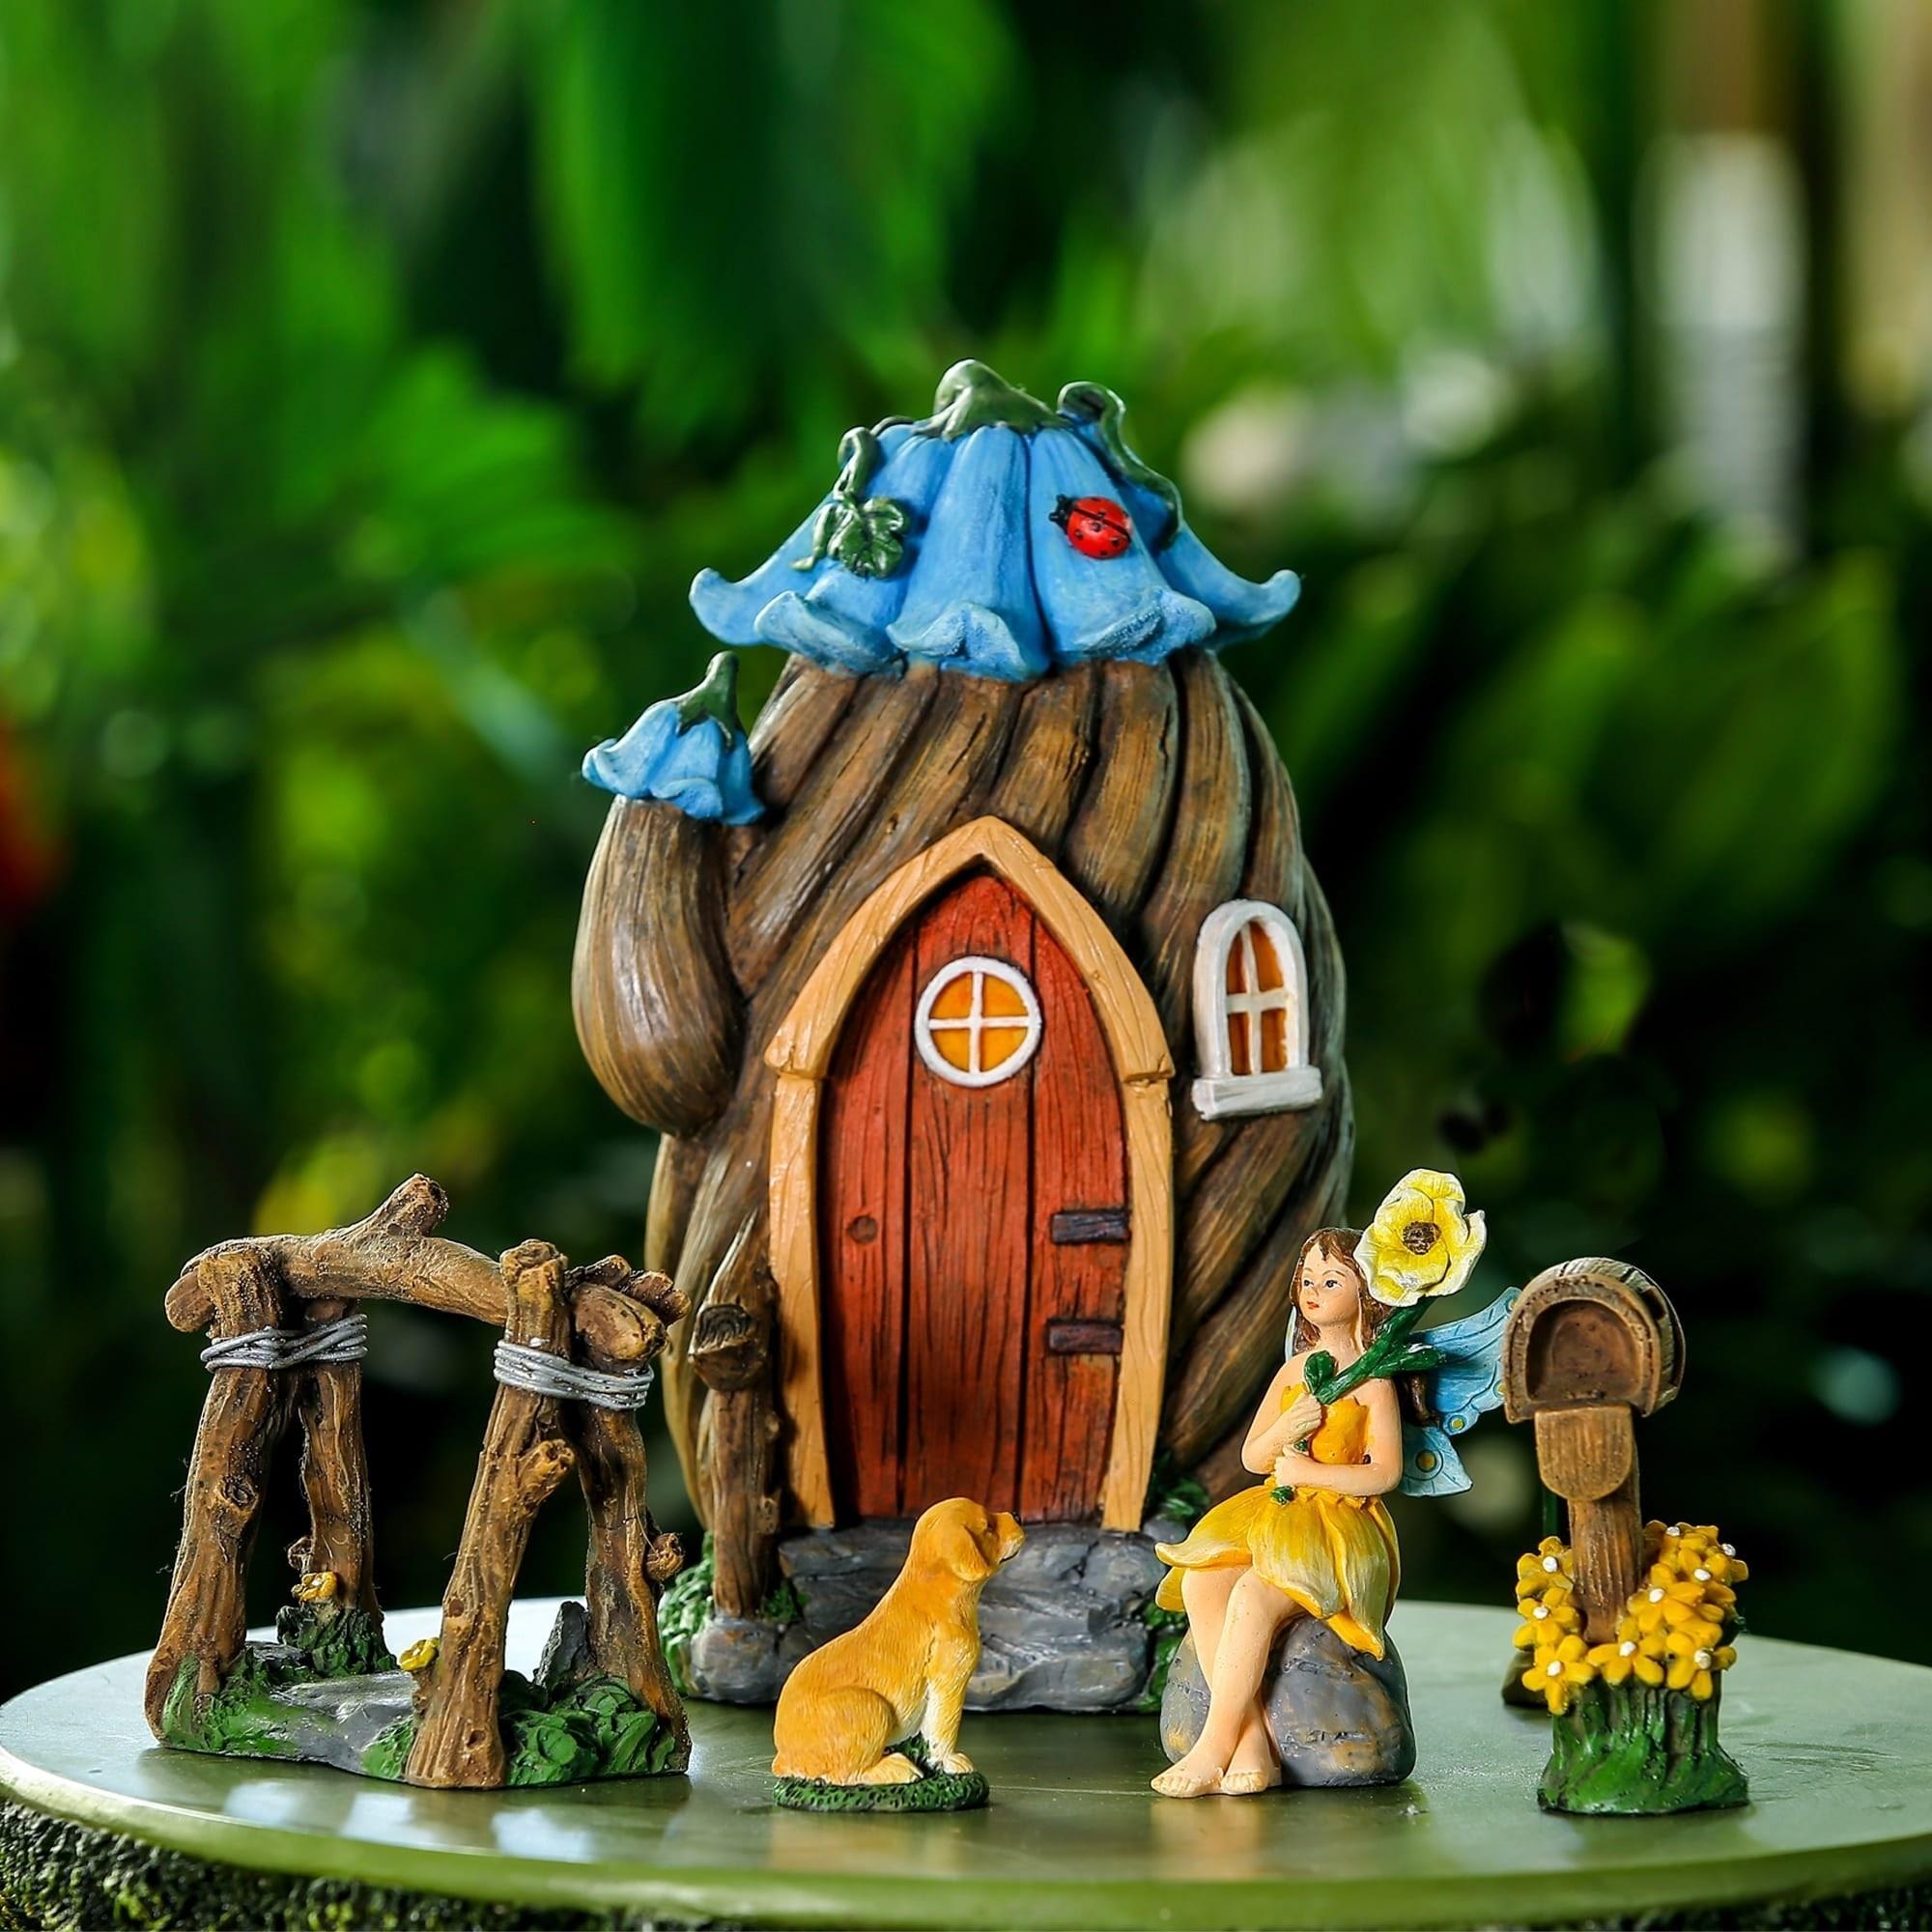 Winsome House 5pc Flower House Miniature Fairy Garden Set...